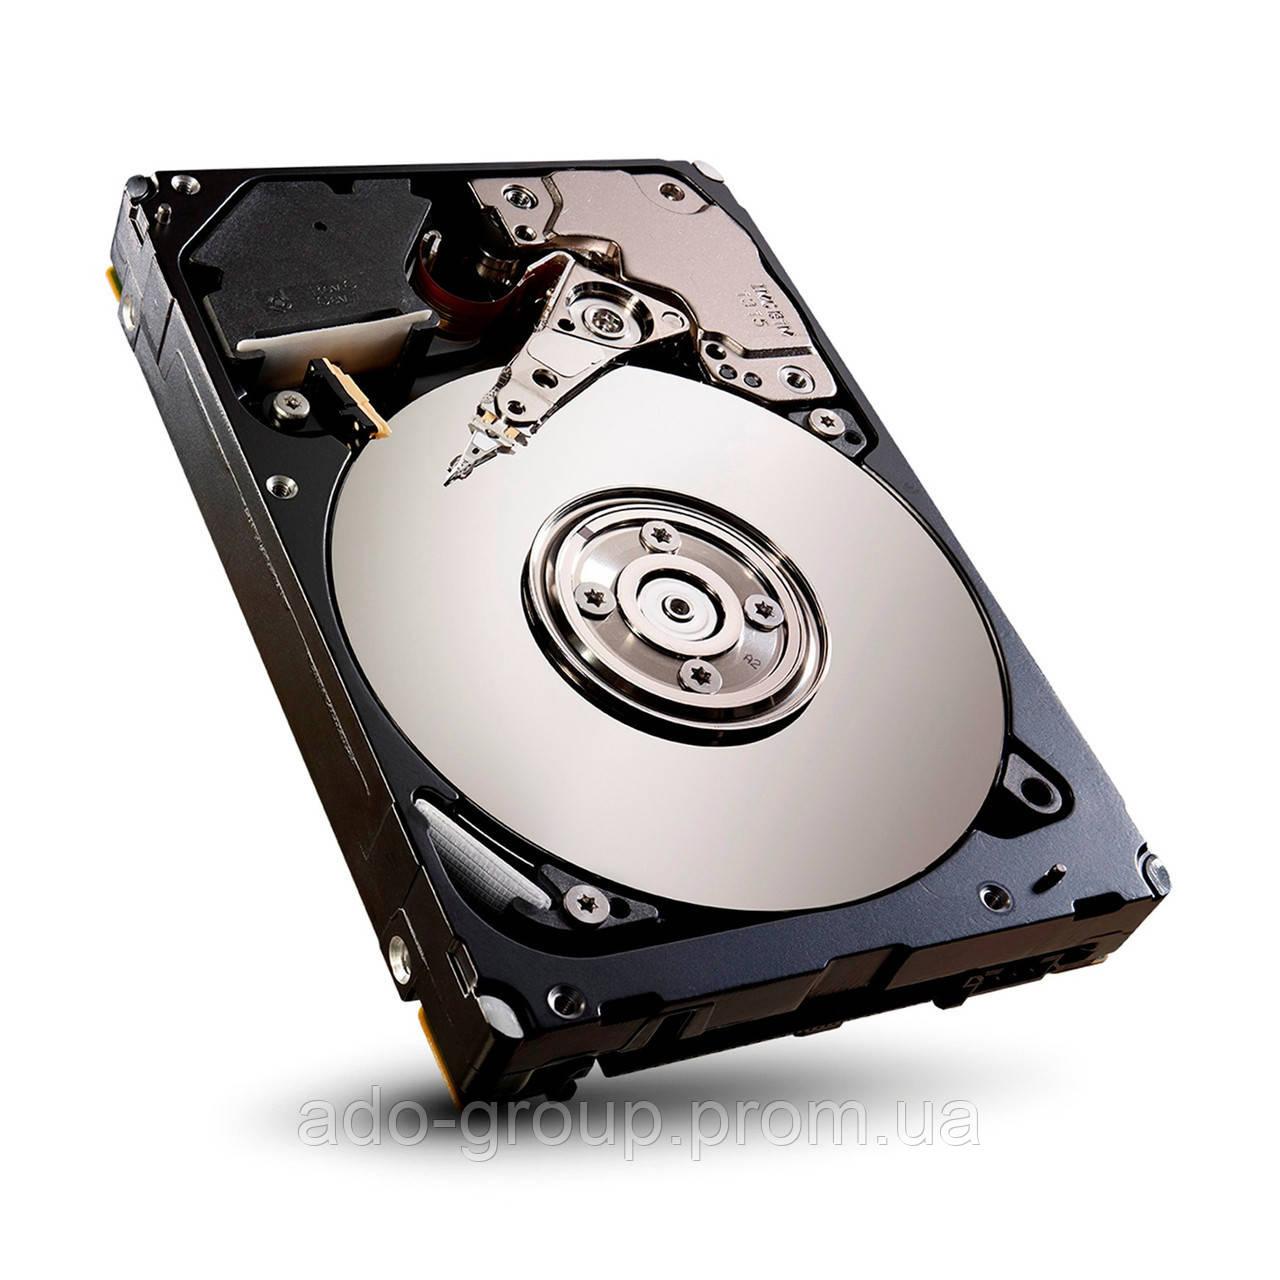 "1KWKJ Жесткий диск Dell 500GB SATA 7.2K  3.5"" +"